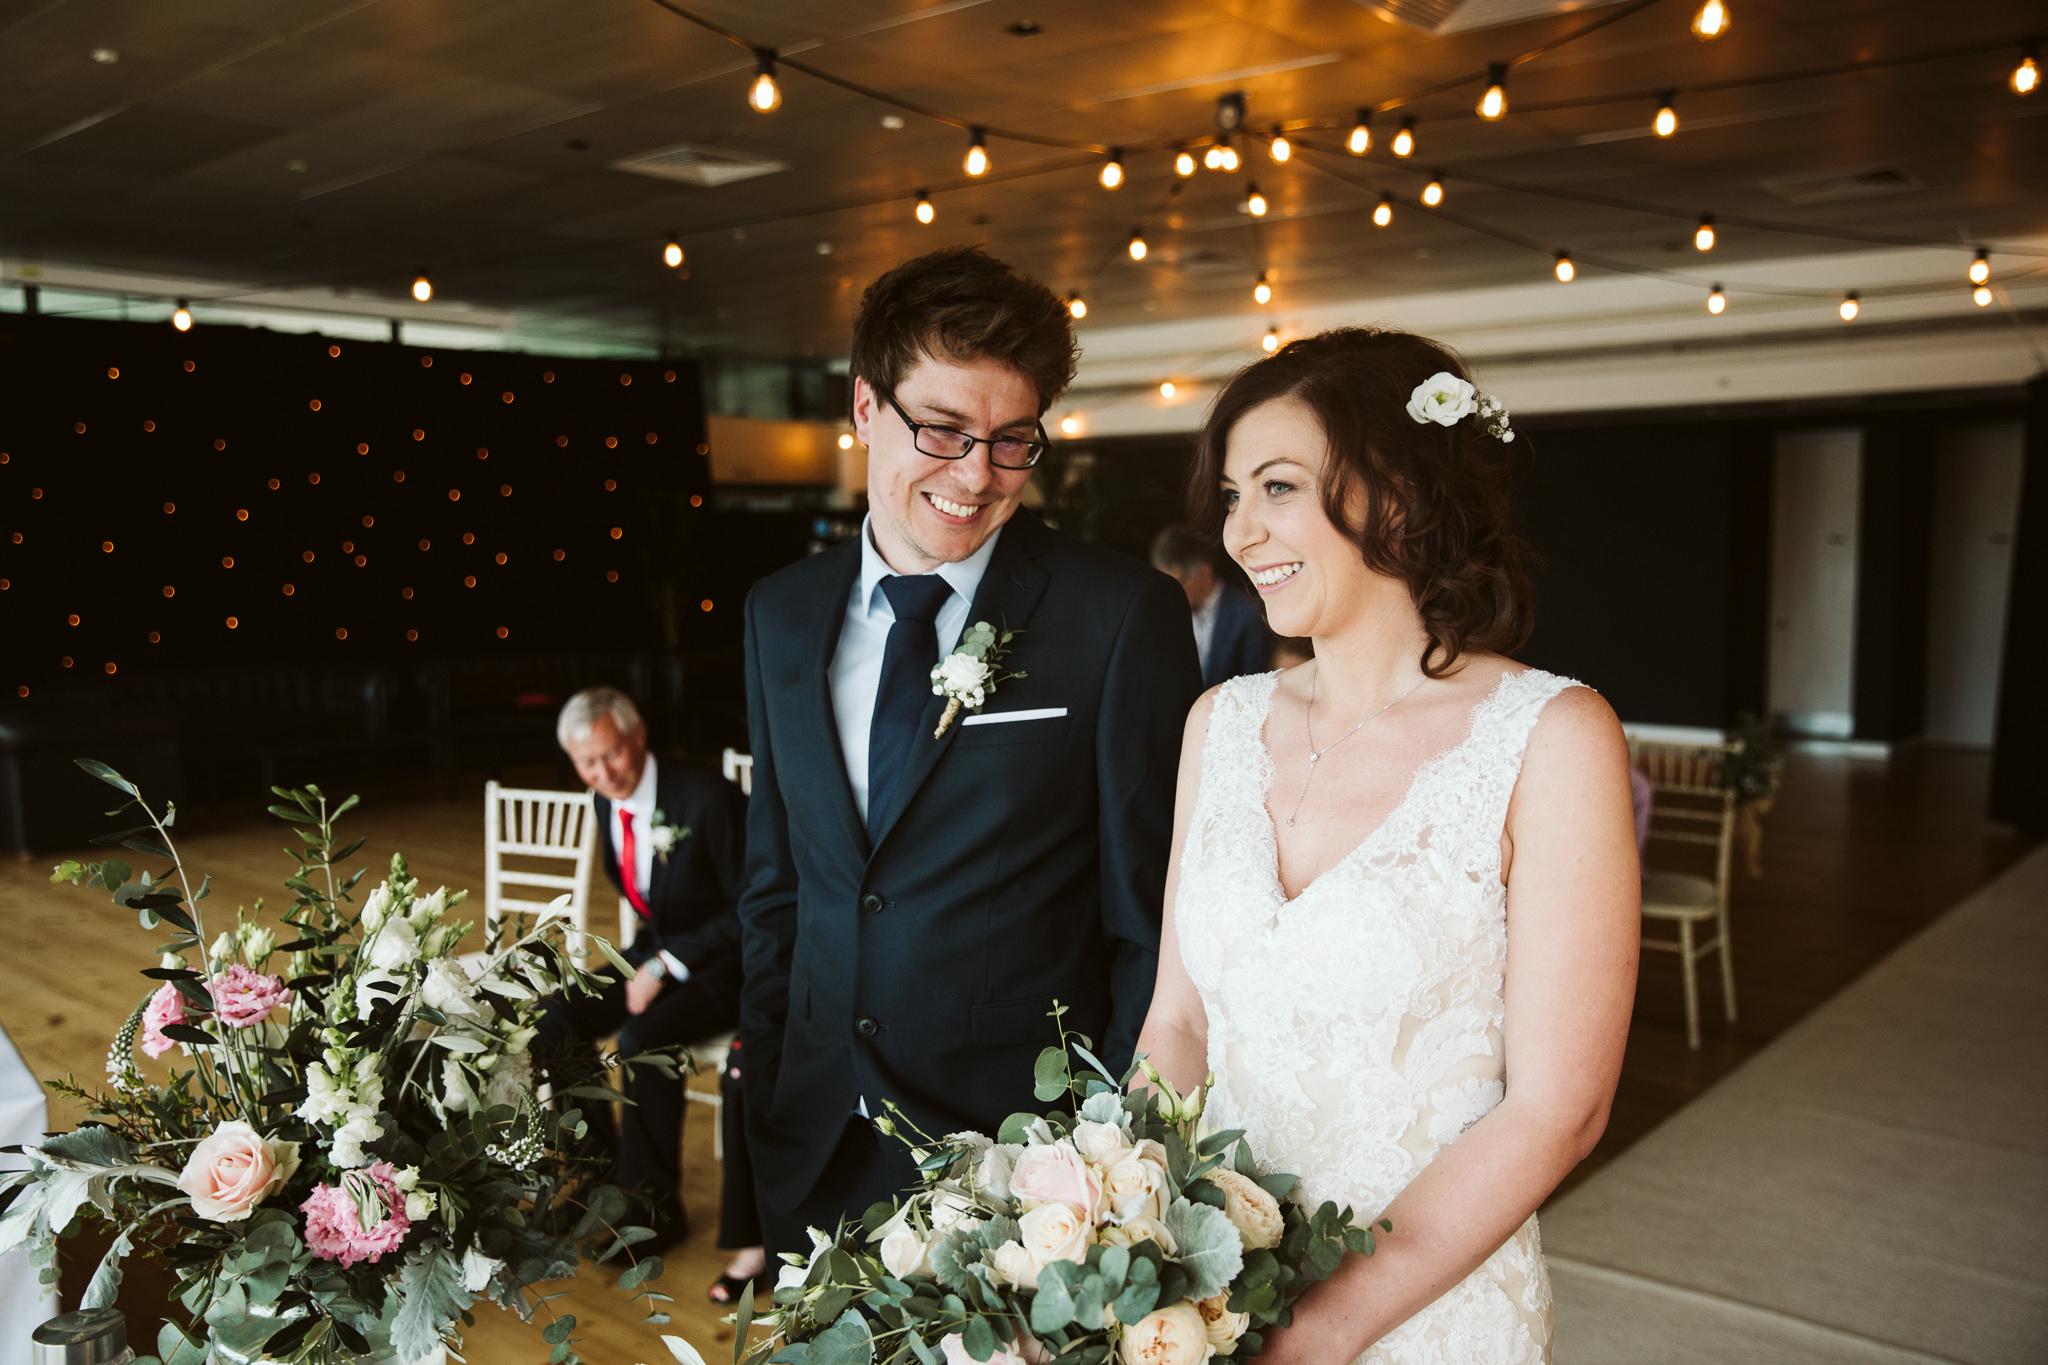 baltic-wedding-margarita-hope (22).jpg